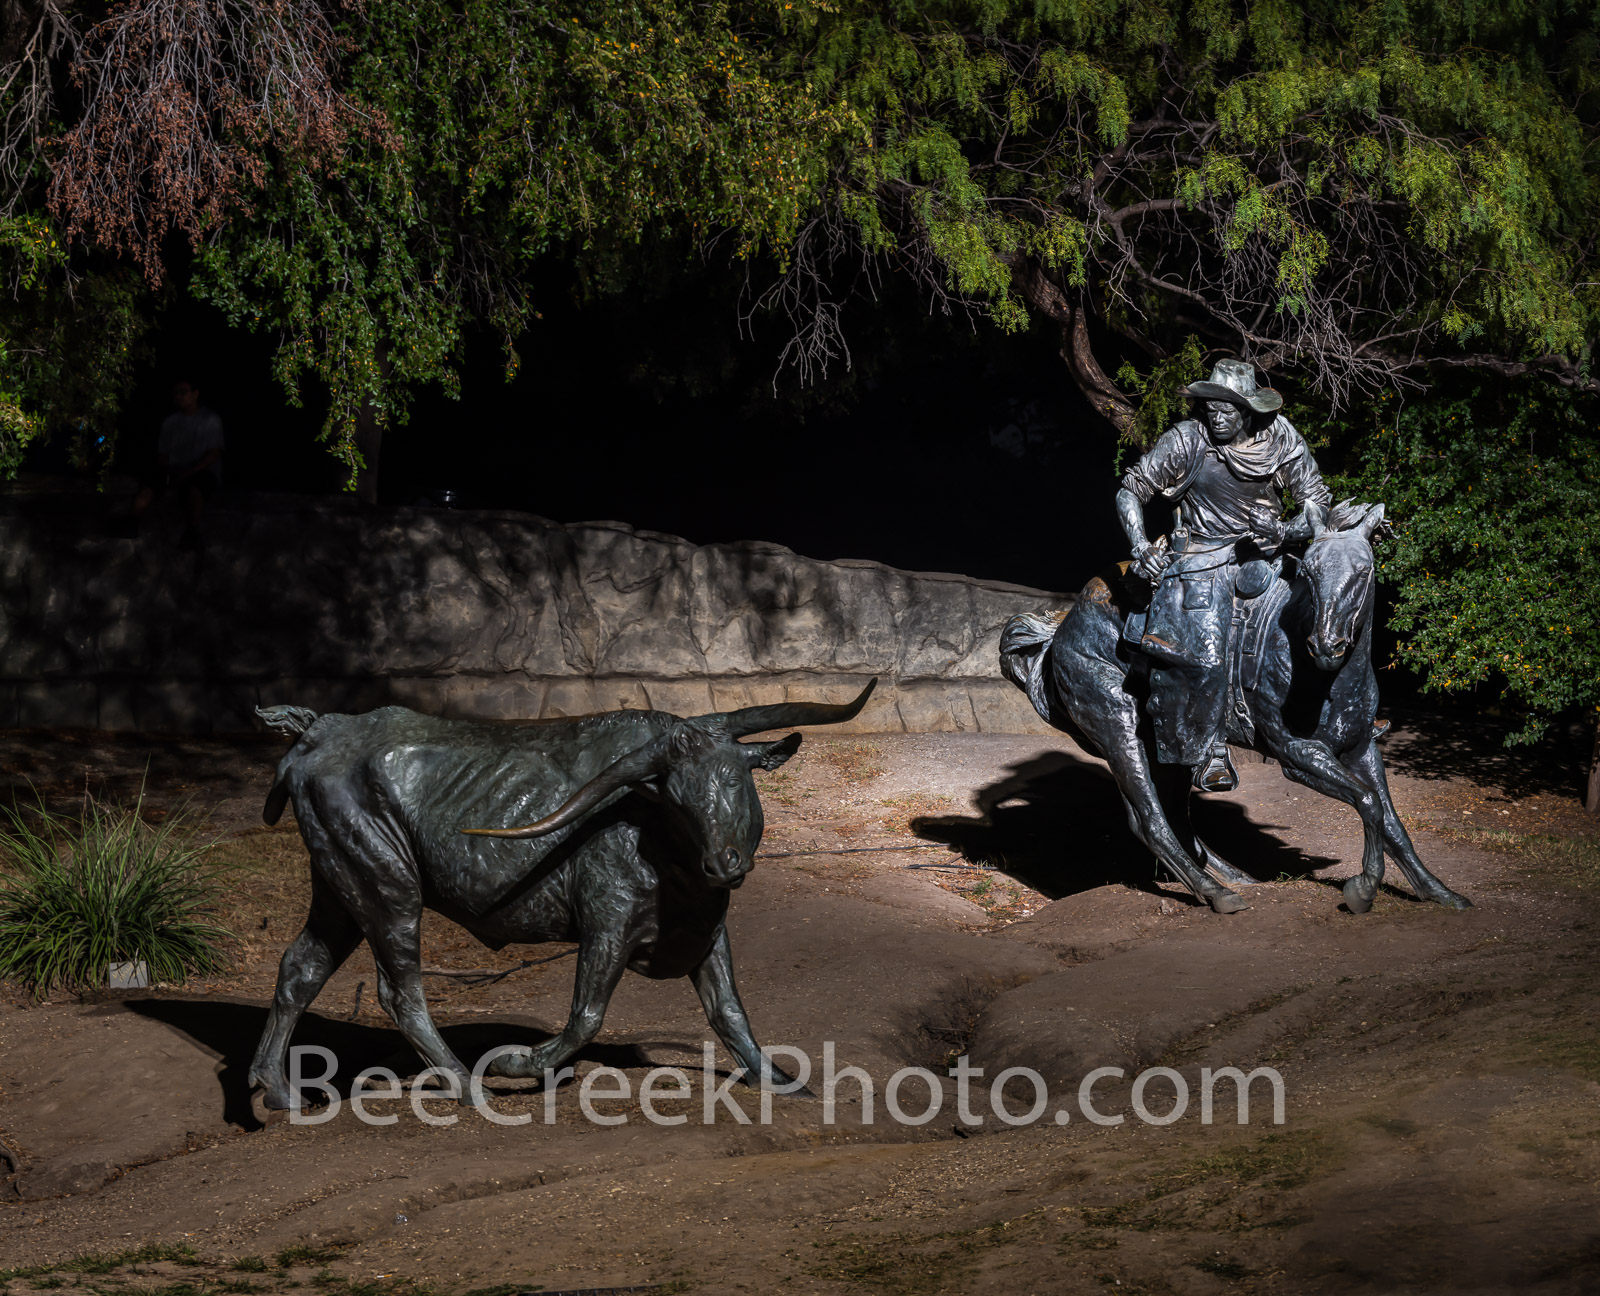 dallas, cowboy, steer, longhorn, bronze statue, pioneer plaza, trail rider, cattle drive, art, sculptures, bronze, statues, 49 longhorns, shawnee trail, pioneer park, decor, , photo